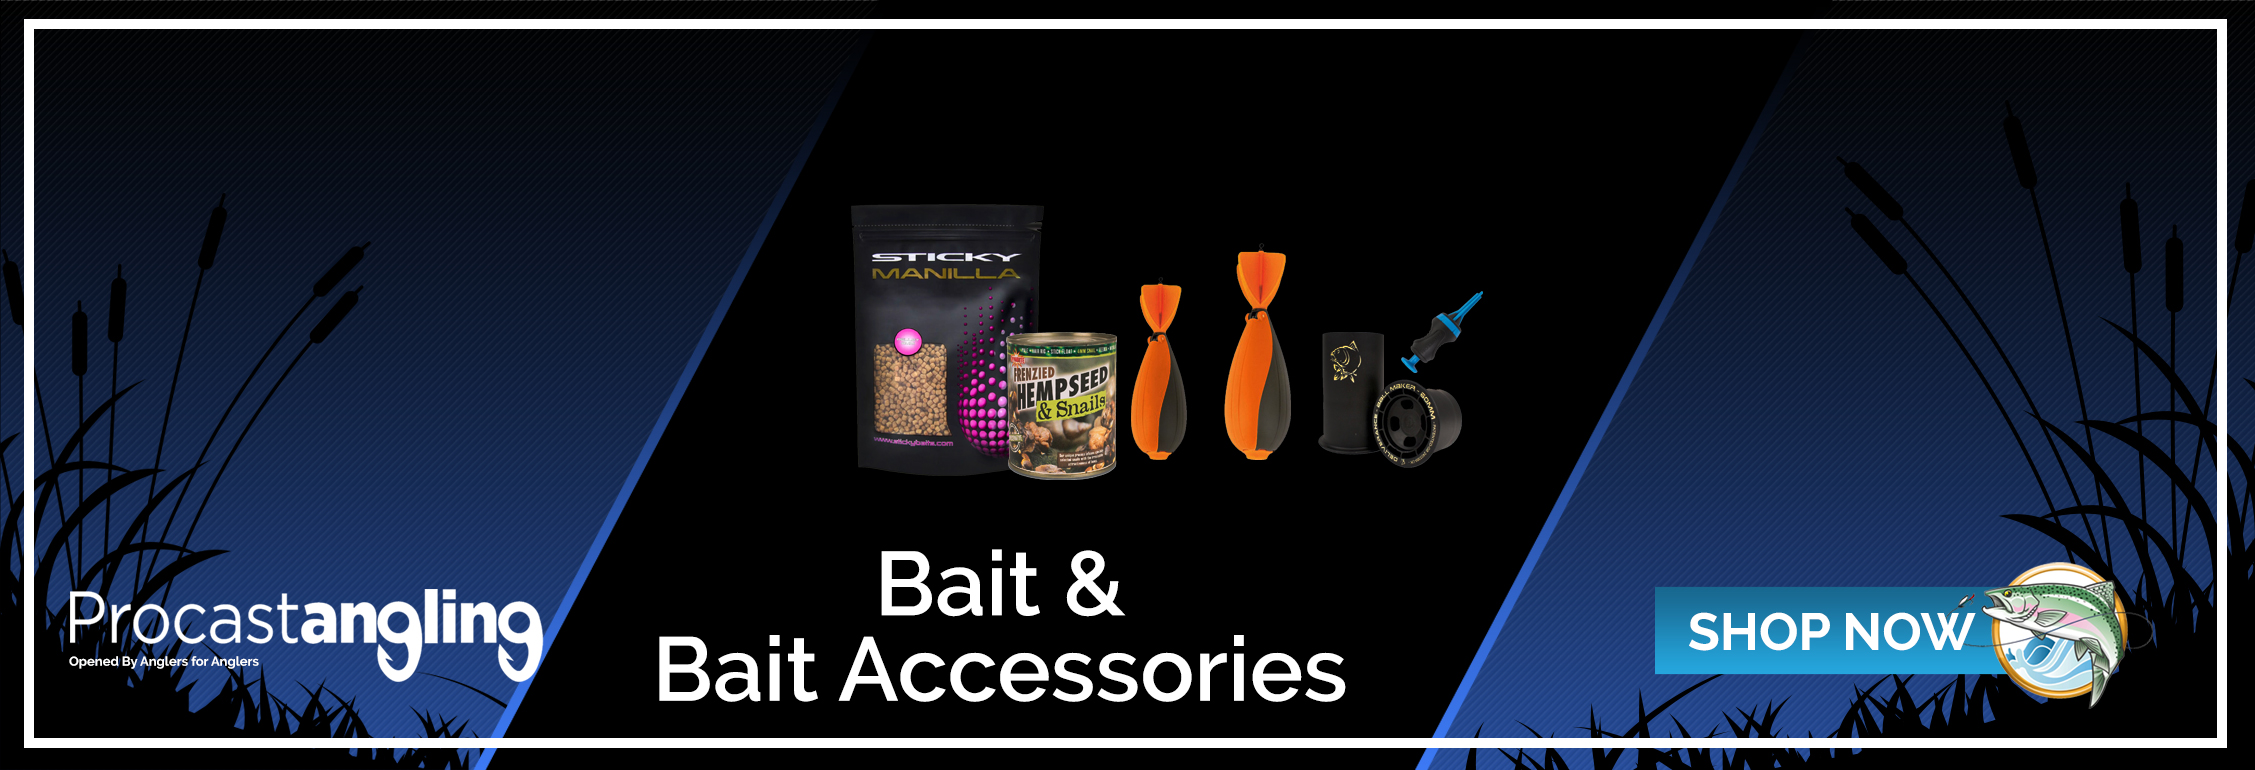 BAIT & BAIT ACCESSORIES